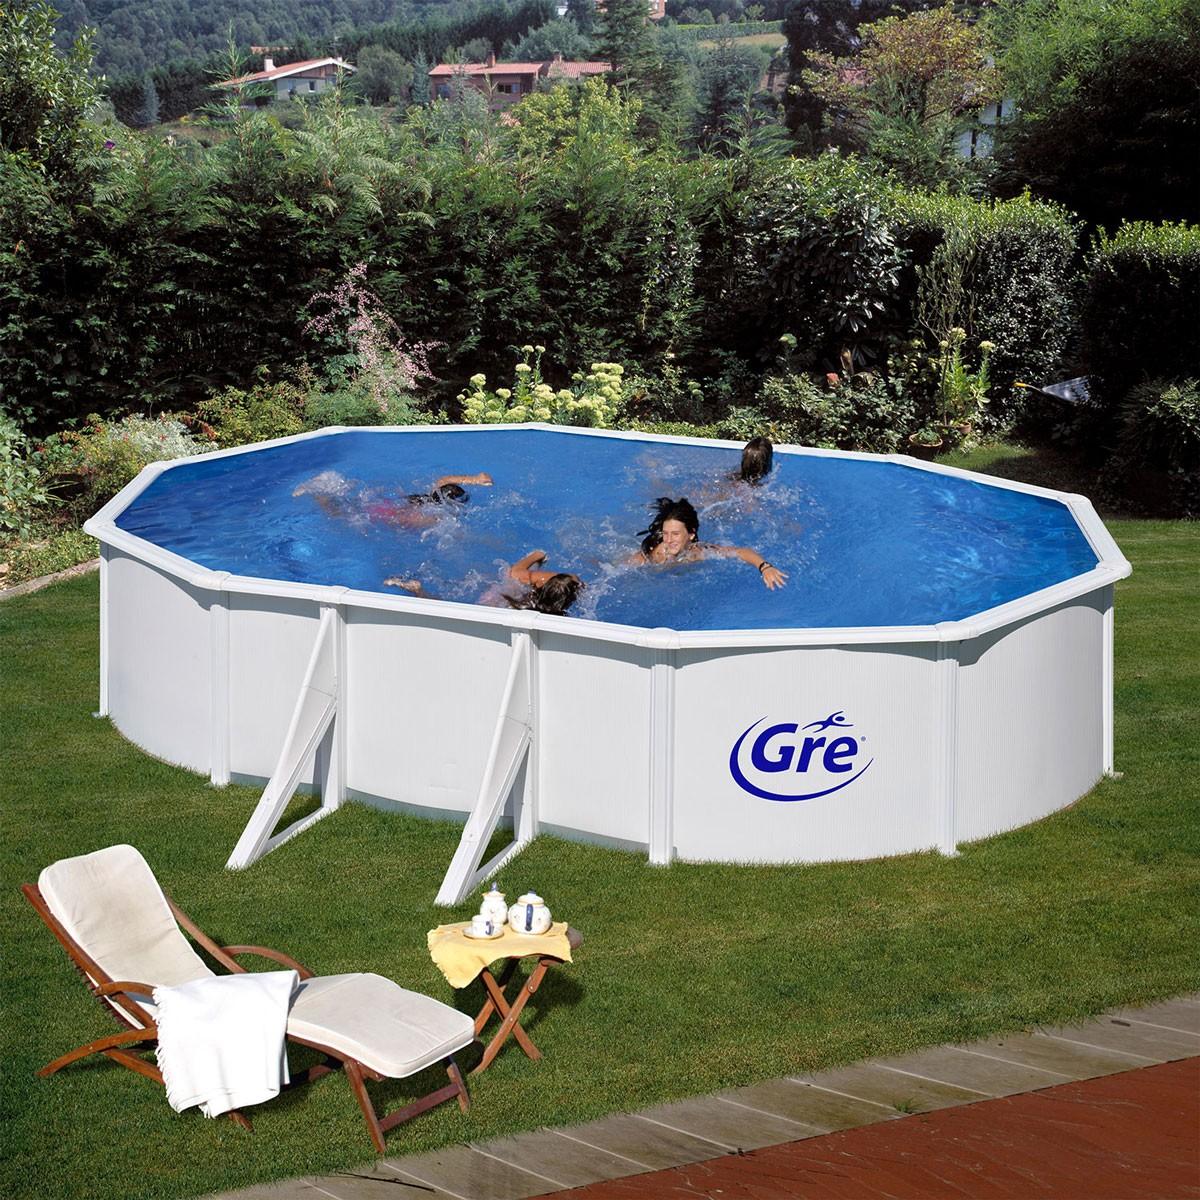 dedeman piscina ovala alba manufacturas gre 610x375x120cm